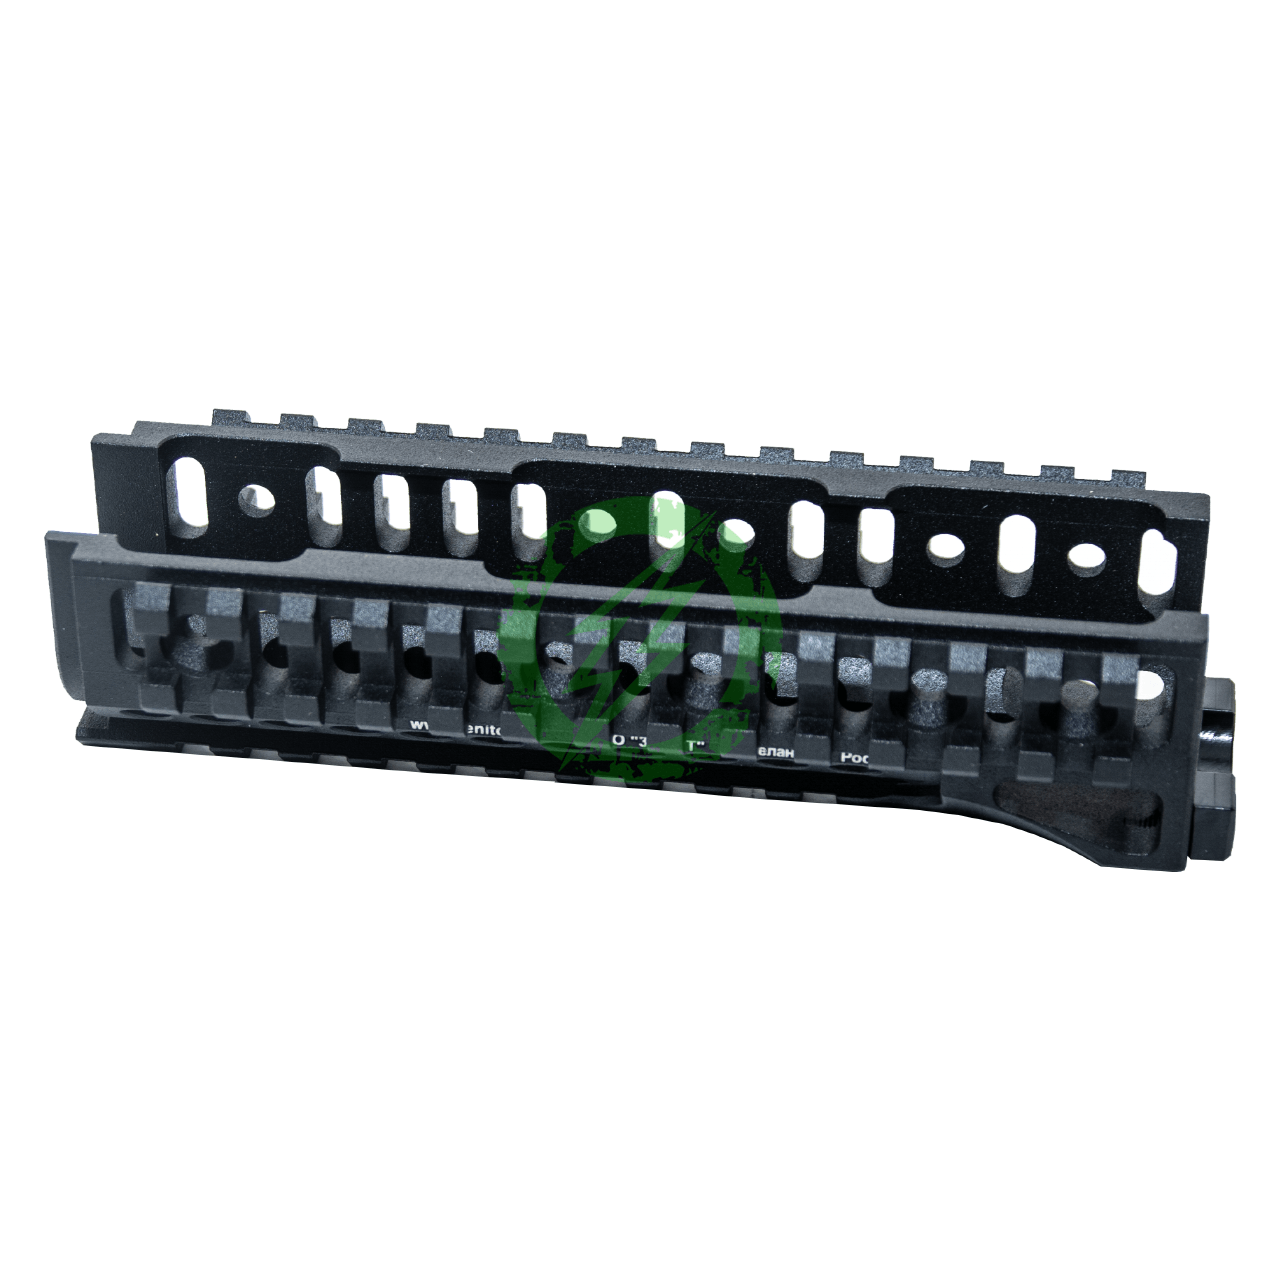 LCT Z-Series B-21M Classic Handguard for PP-19-01 Vityaz   Black